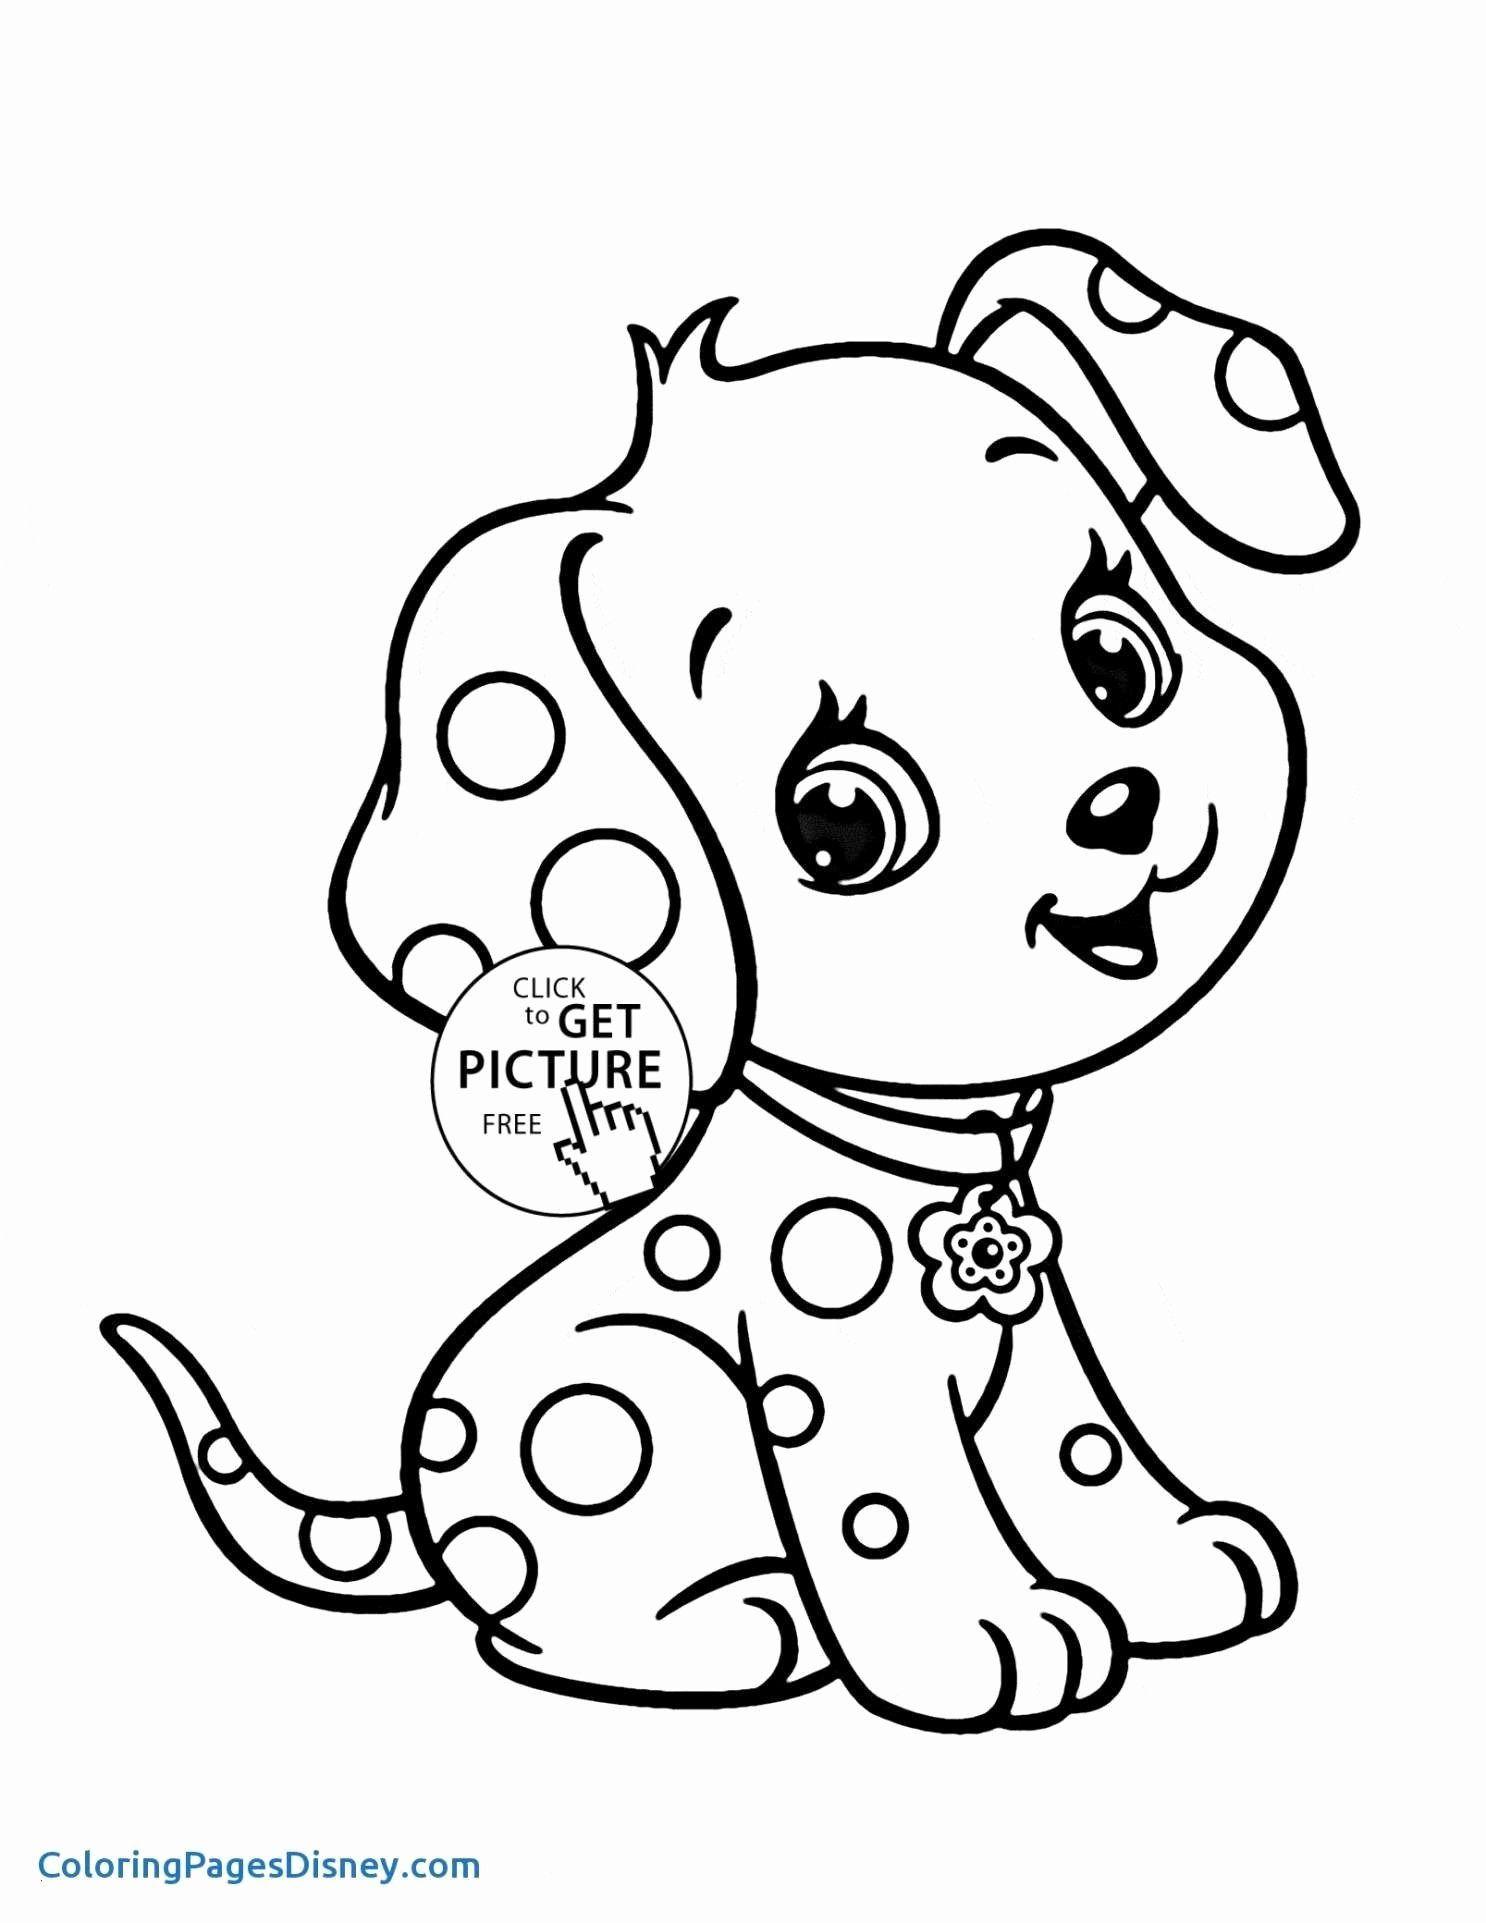 Jojo Siwa Unicorn Coloring Pages : unicorn, coloring, pages, Unicorn, Kitty, Coloring, Unique, Pages, Disney, Princess, Pages,, Puppy